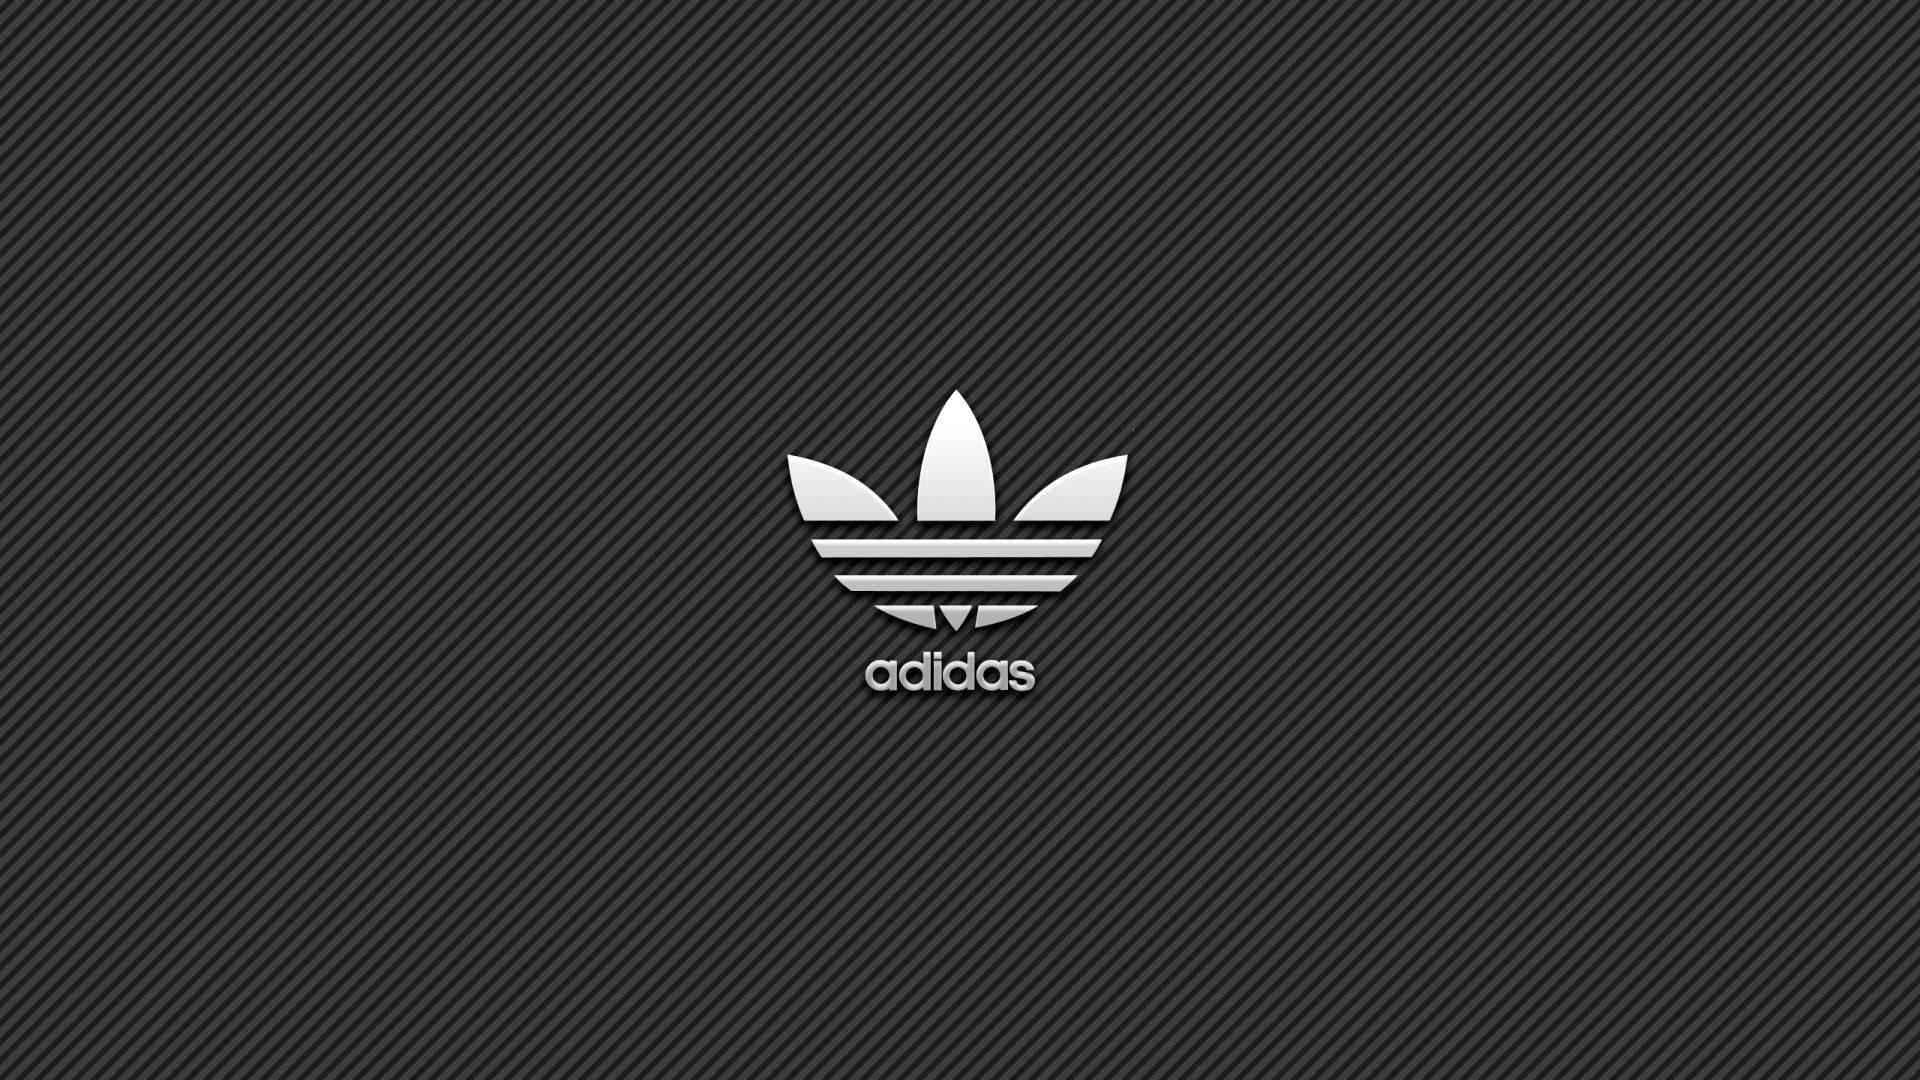 Adidas Originals - Adidas , HD Wallpaper & Backgrounds